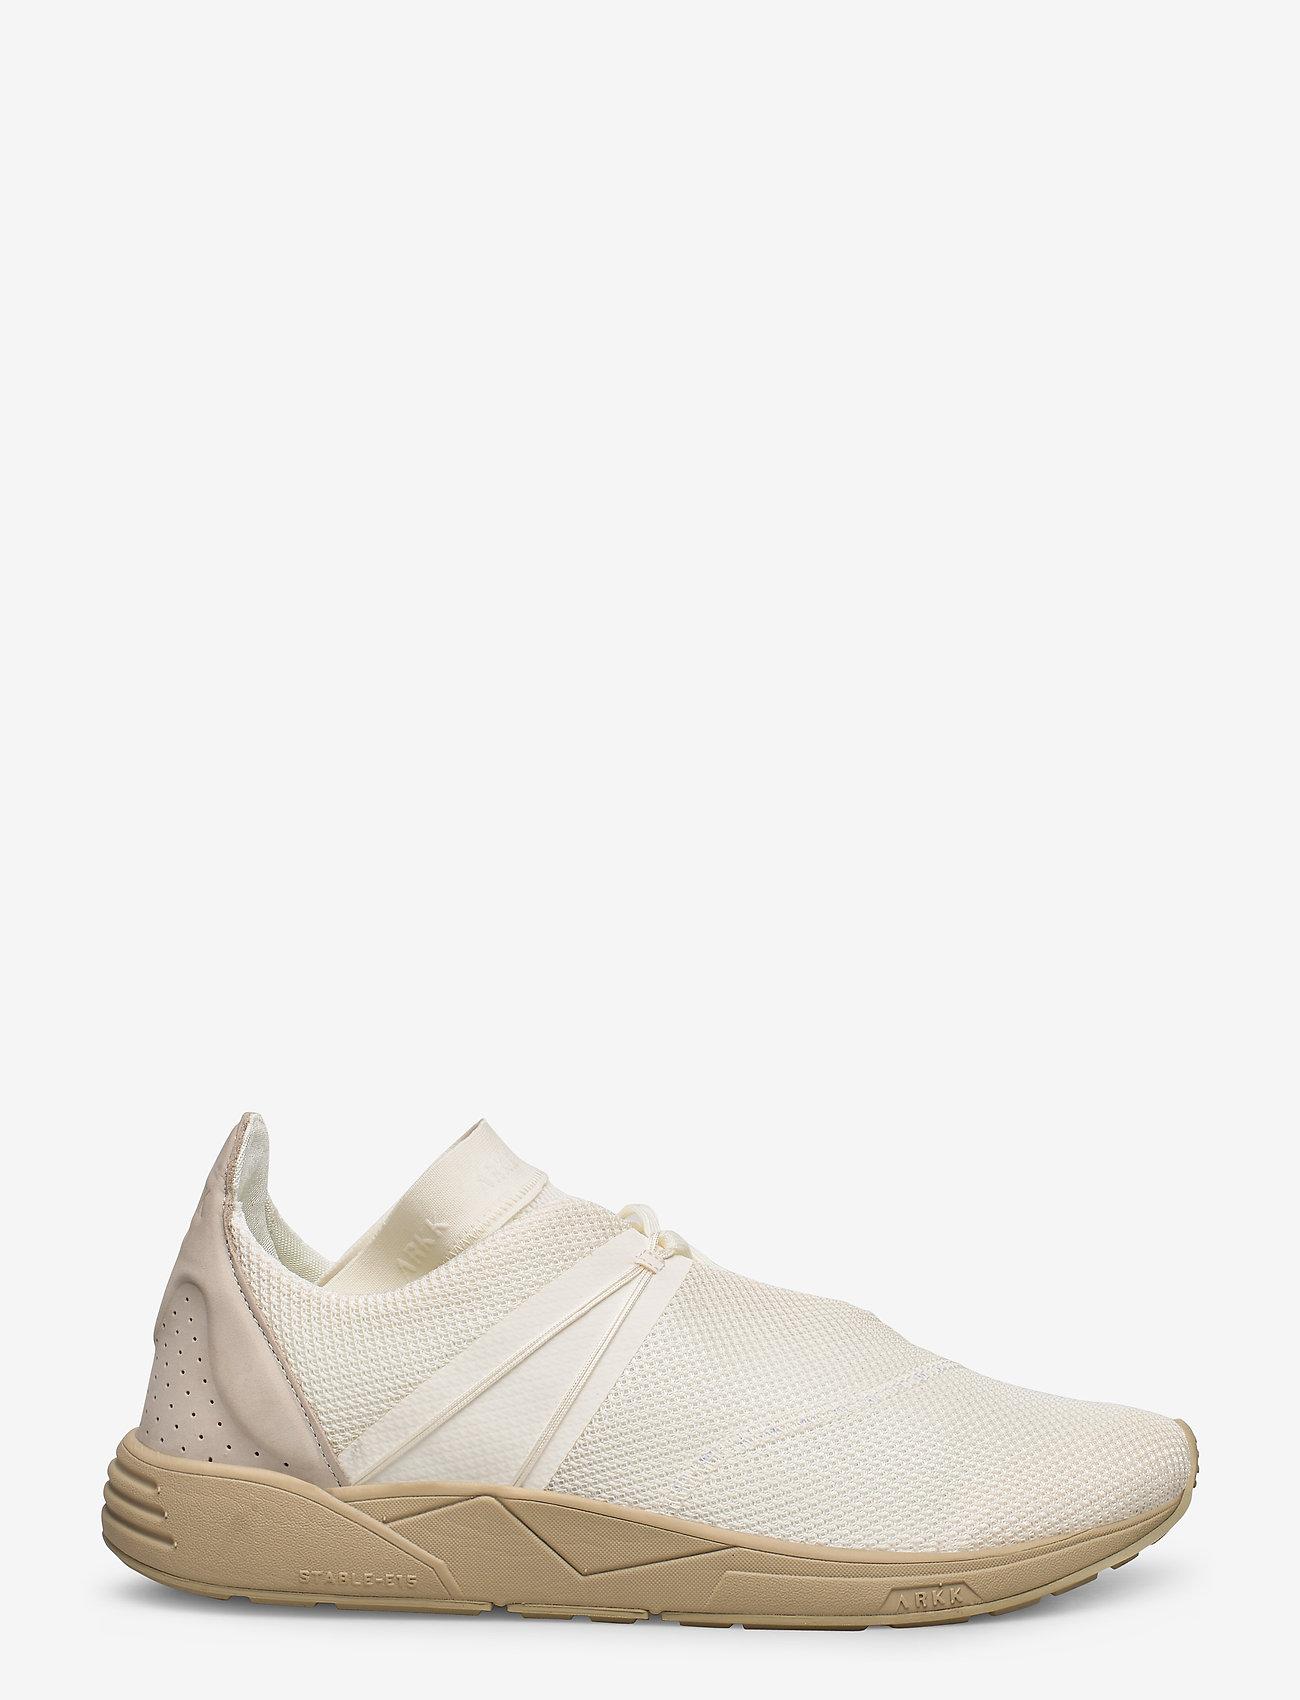 Eaglezero S-e15 Off White Tan - Men (Off White) (849 kr) - ARKK Copenhagen